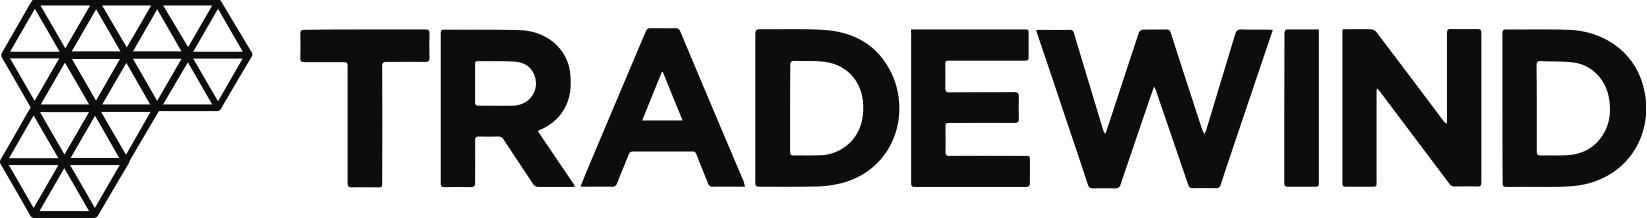 twm-logo